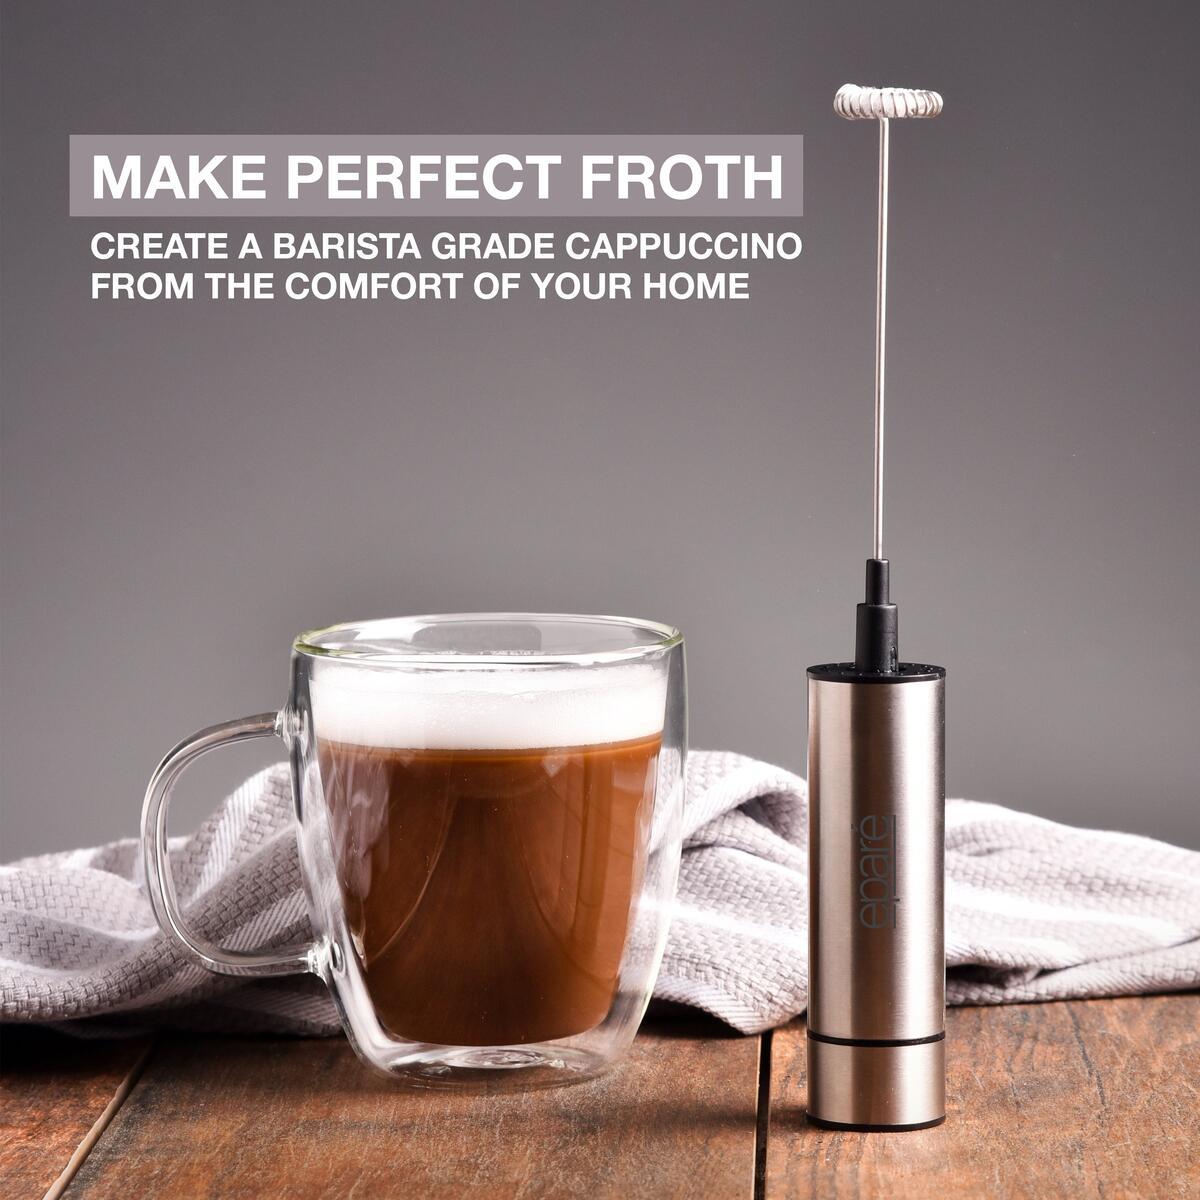 Eparé Professional Milk Frother